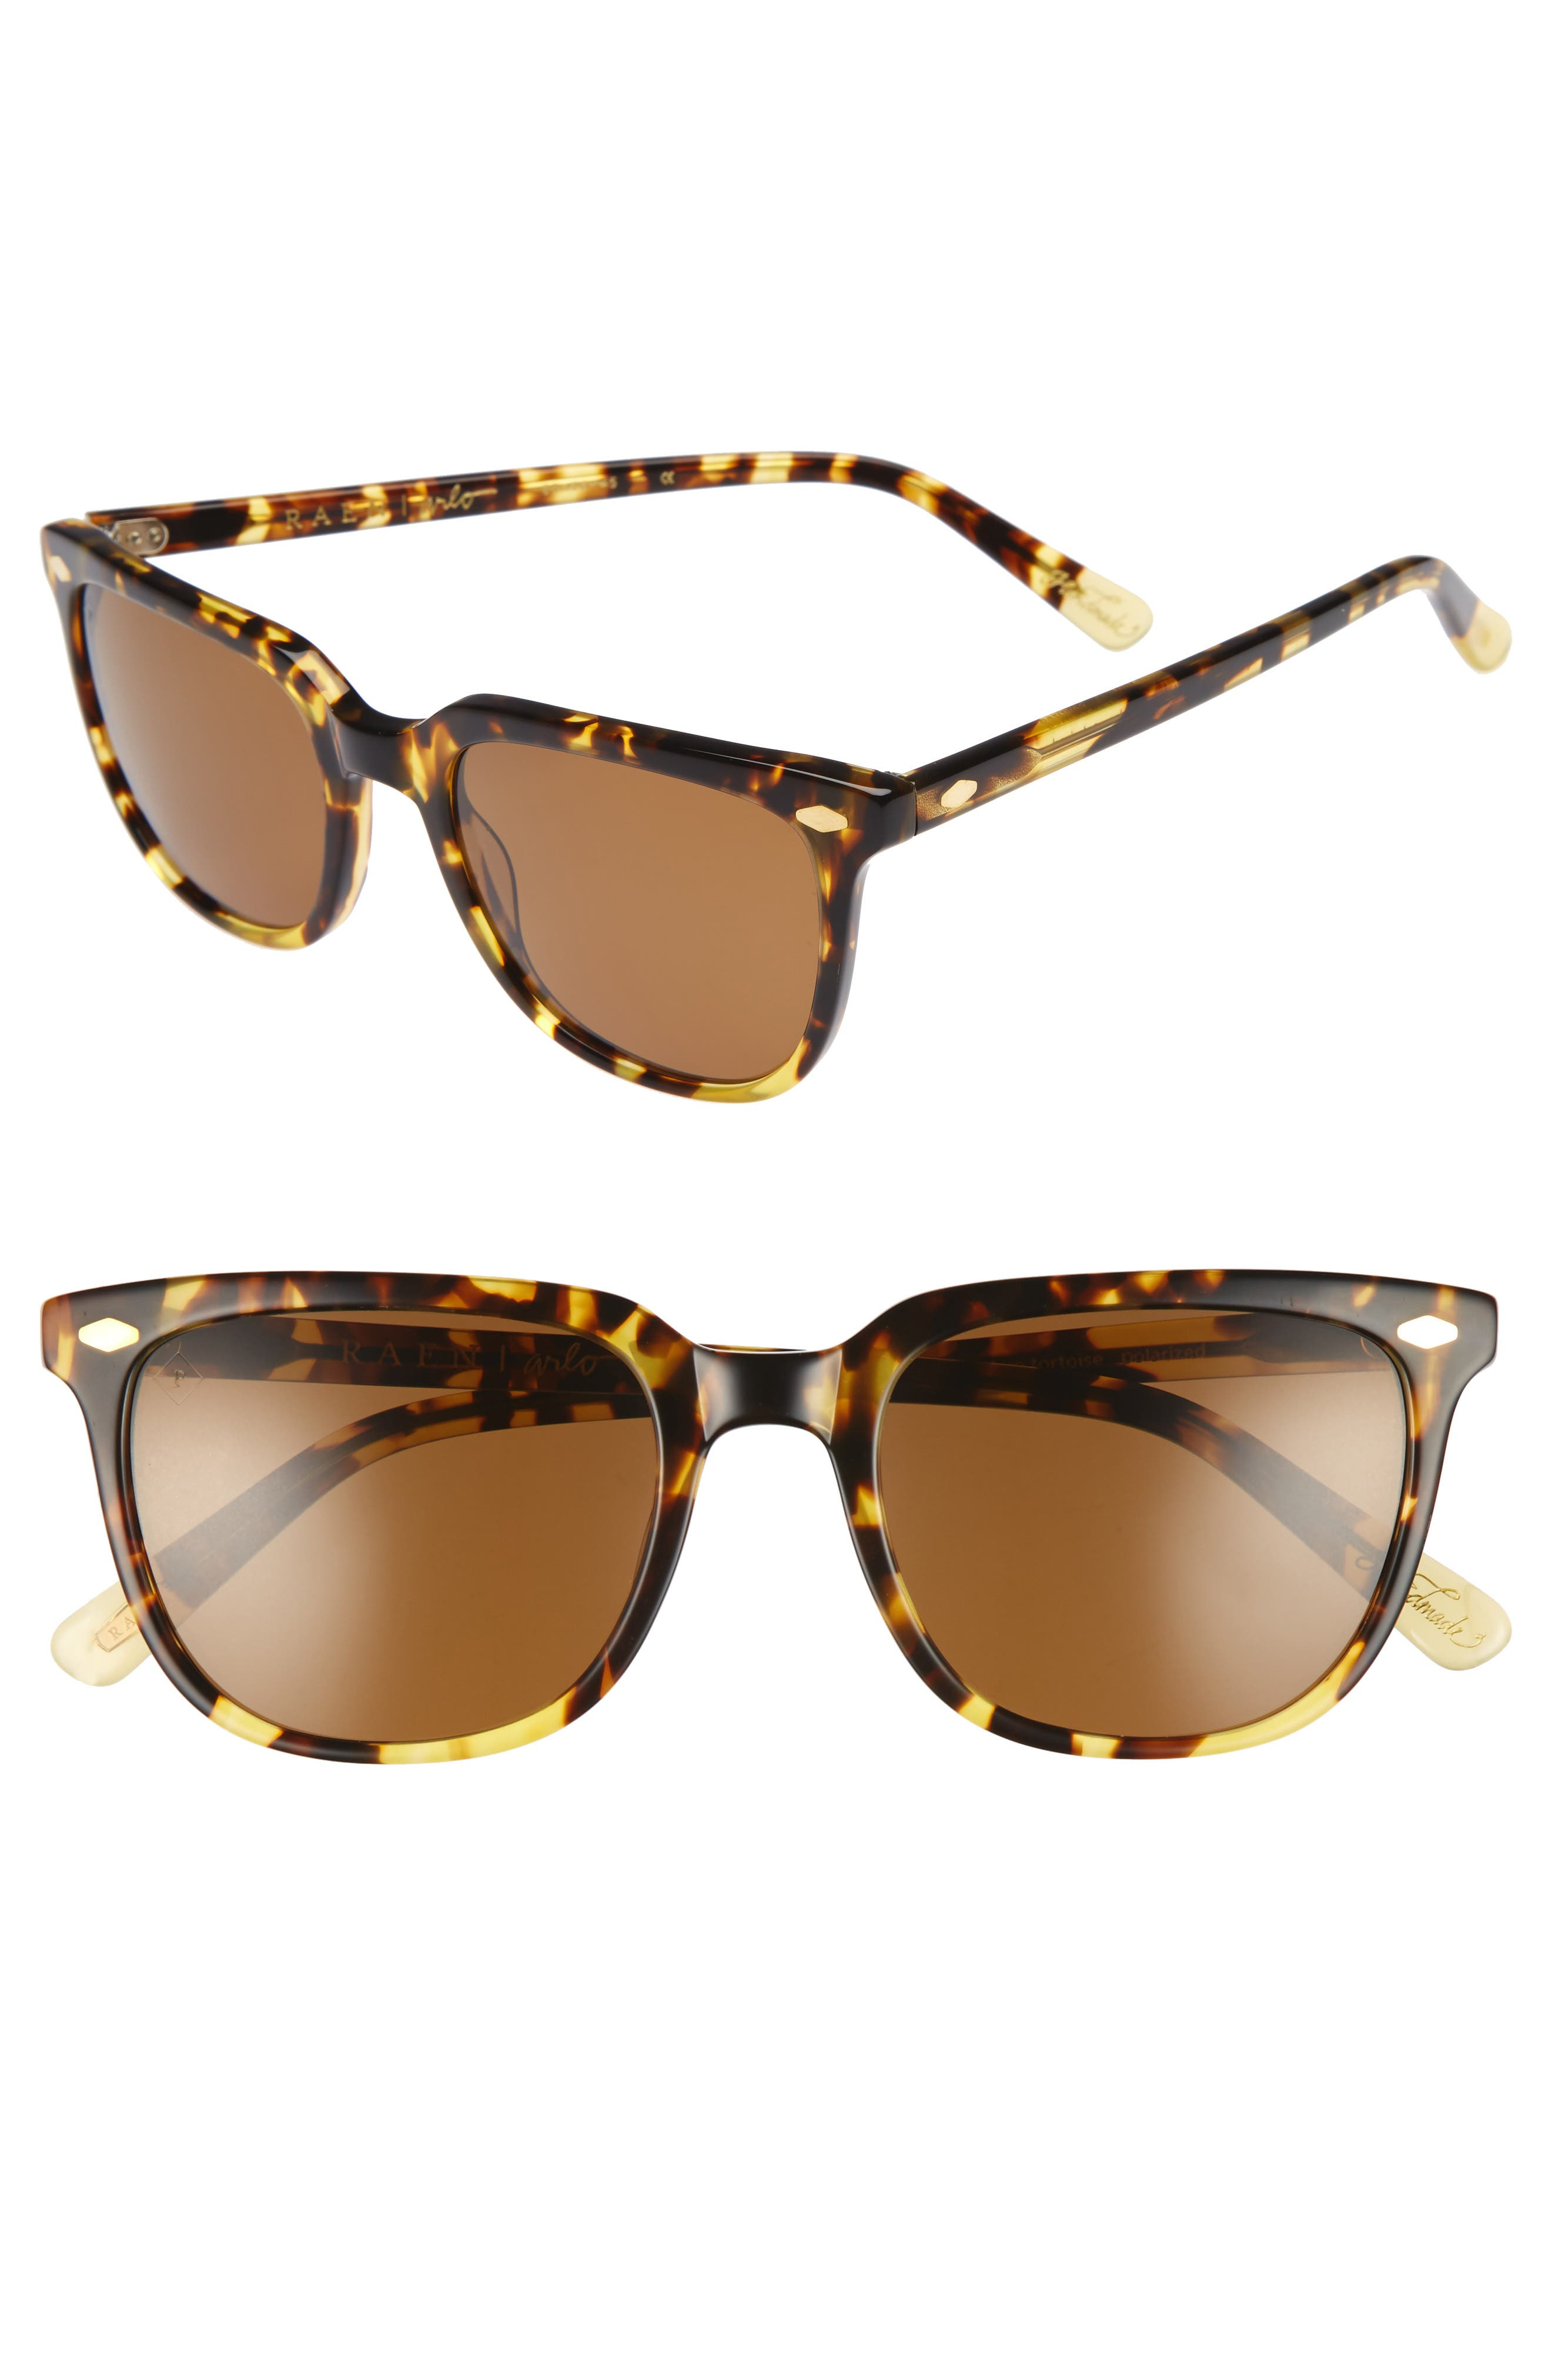 Arlo 53mm Polarized Sunglasses,                         Main,                         color, Tokyo Tortoise/ Brown